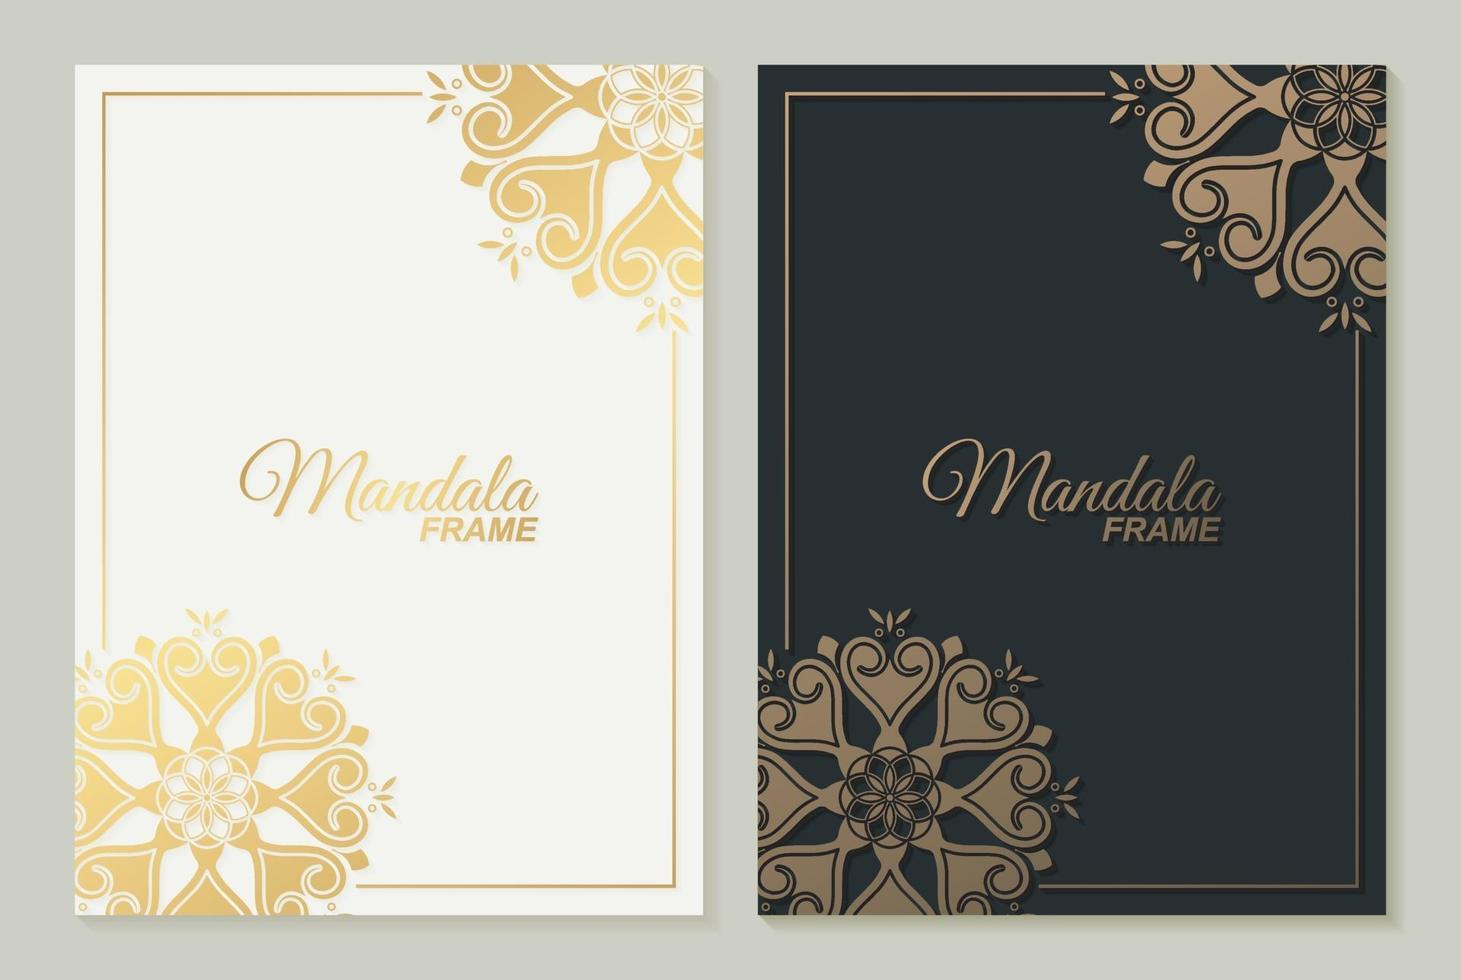 Luxusrahmen Mandala Design-Vorlage vektor